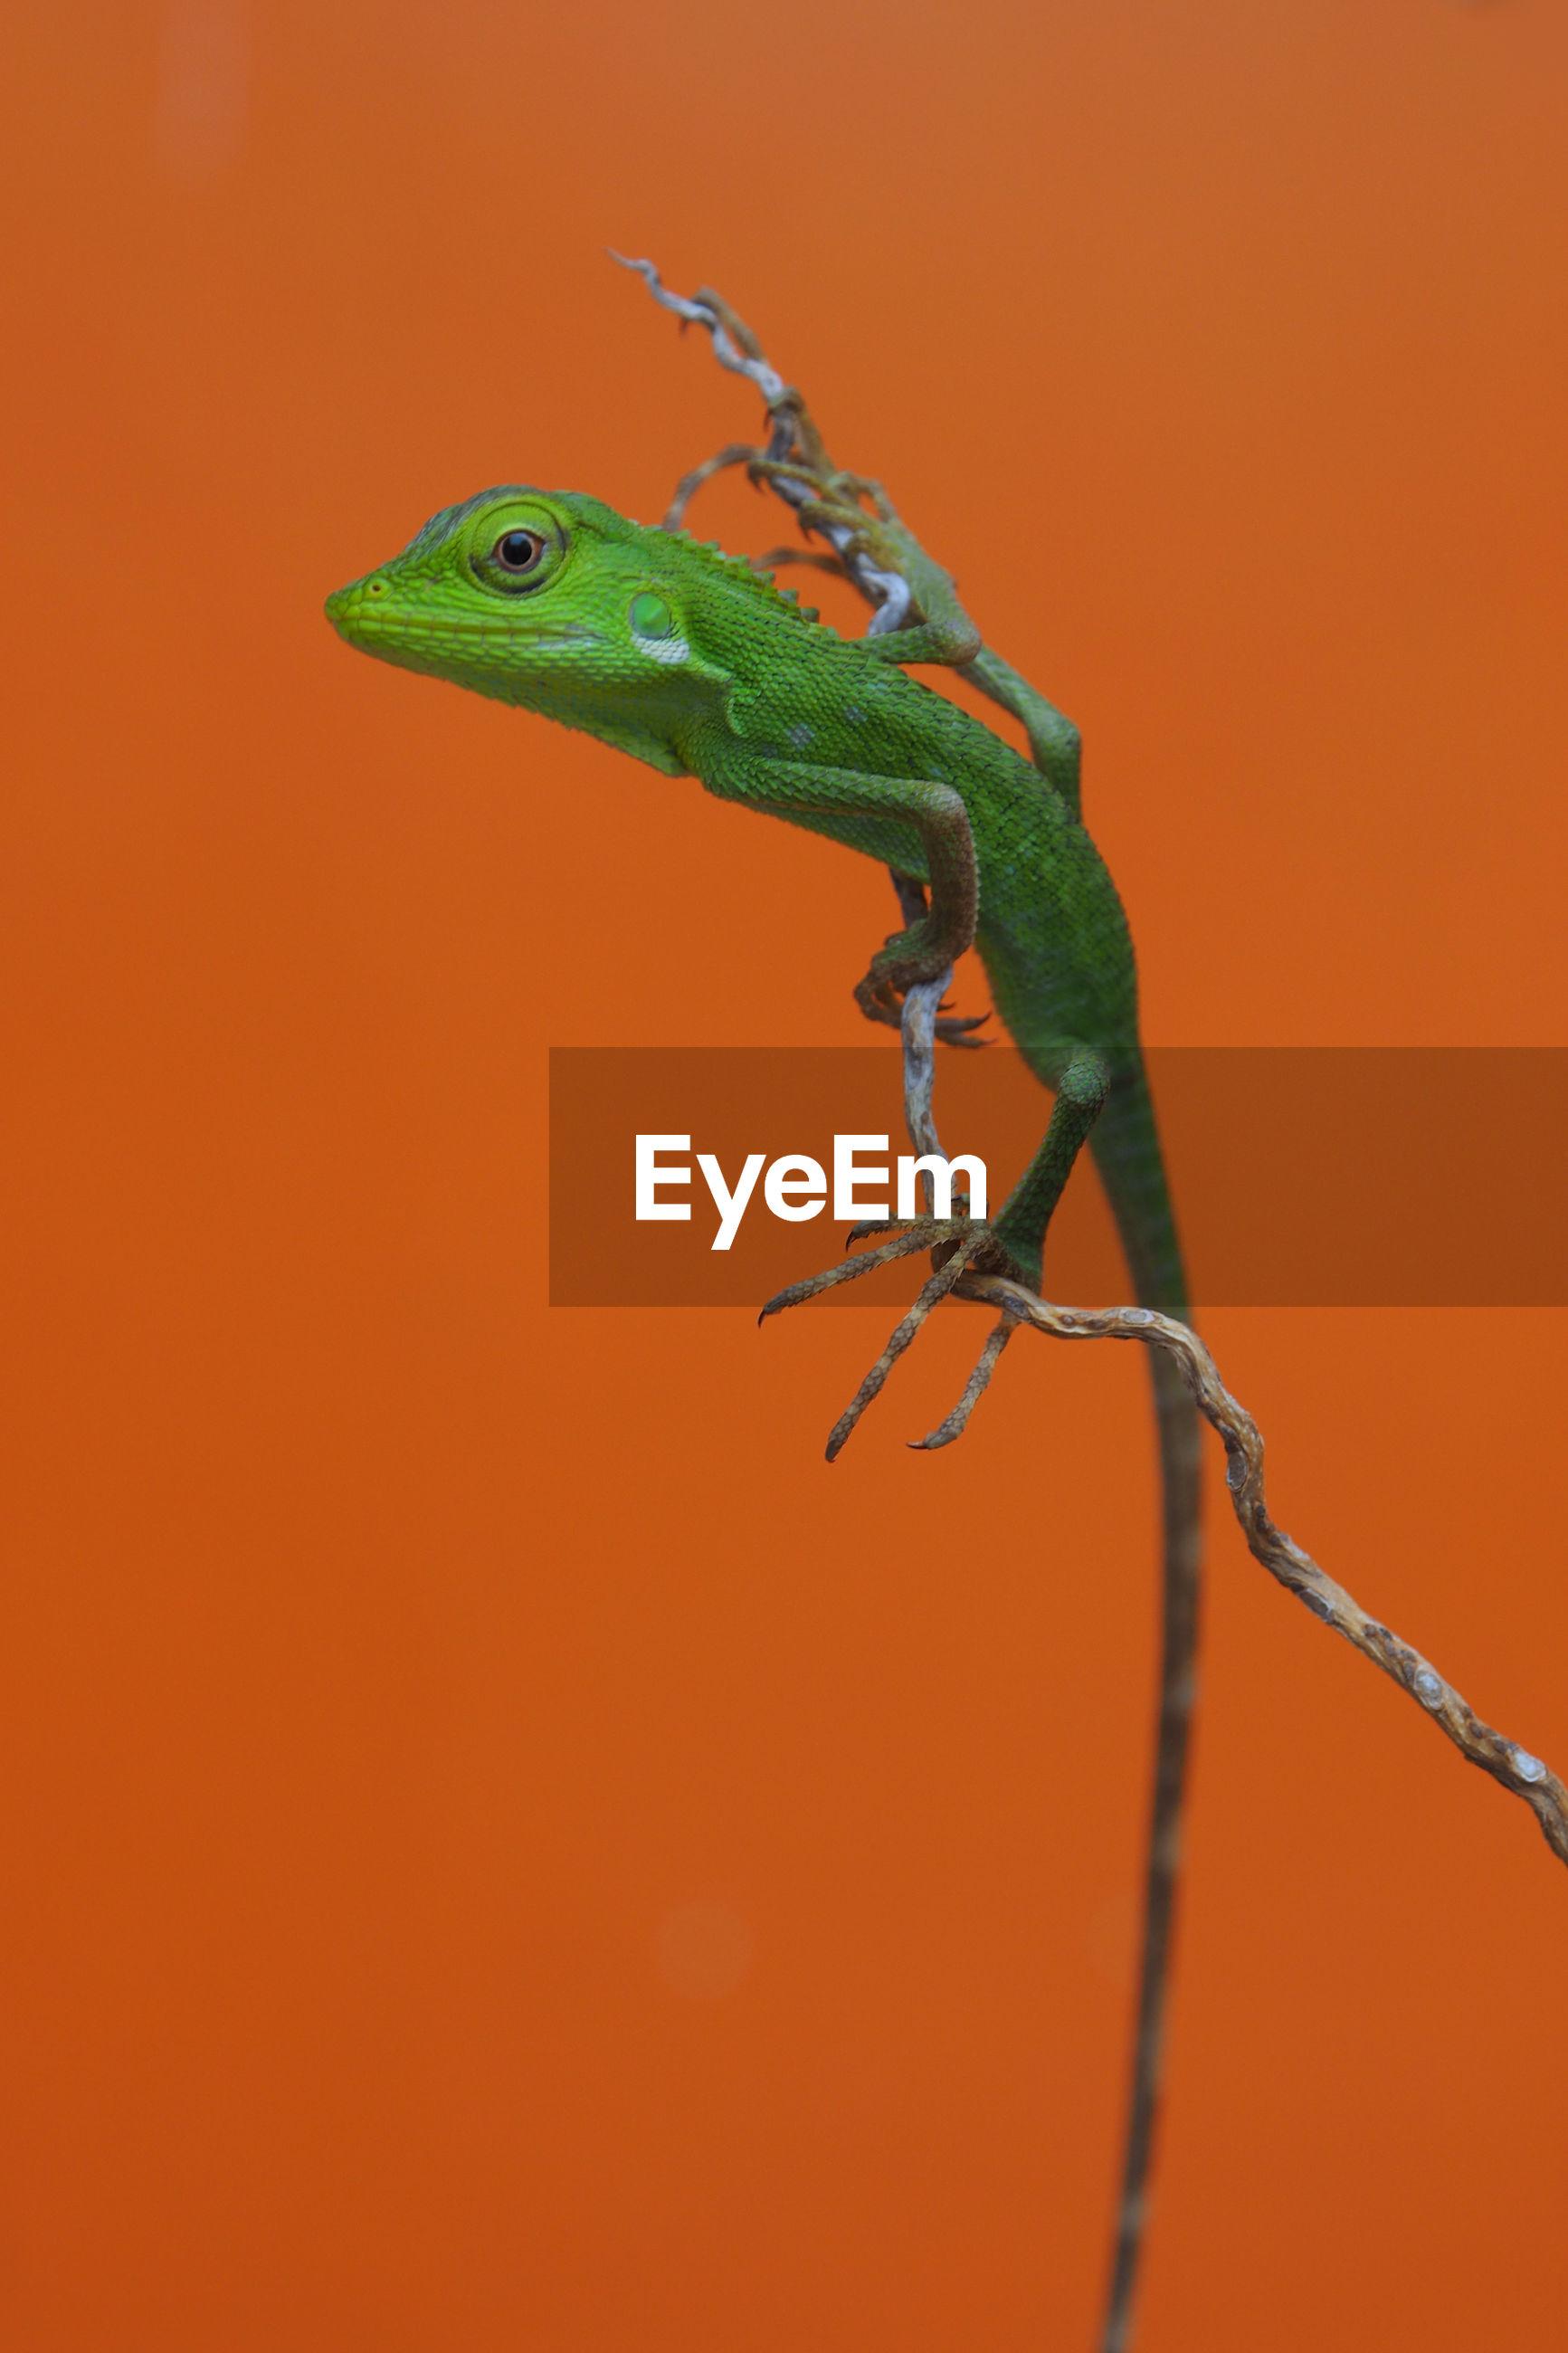 Close-up of lizard on twig against orange background